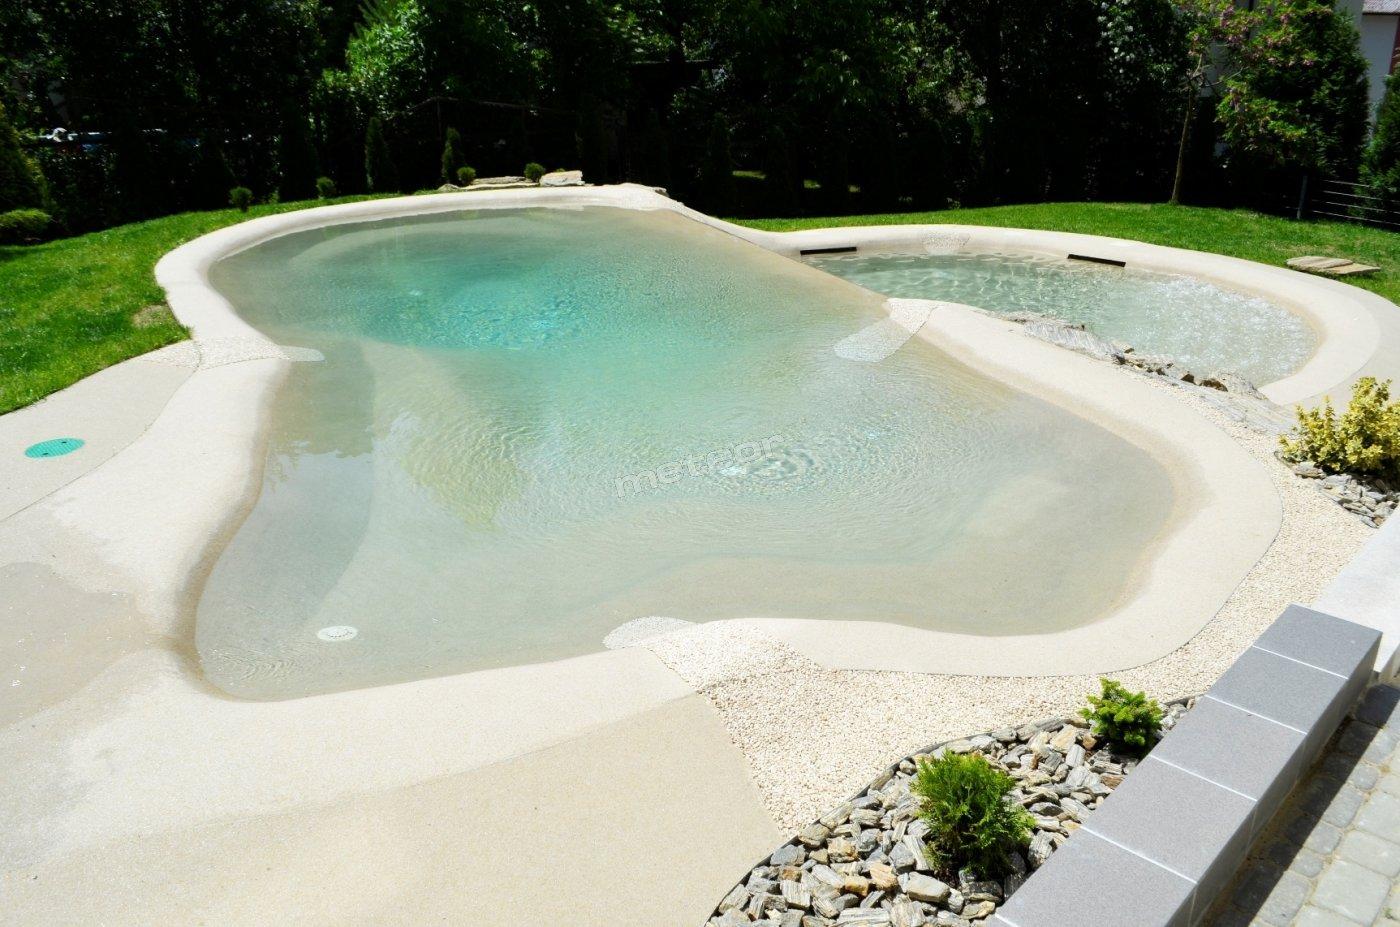 Kompleks basenowy - basen mały (60cm), basen duży (140cm)